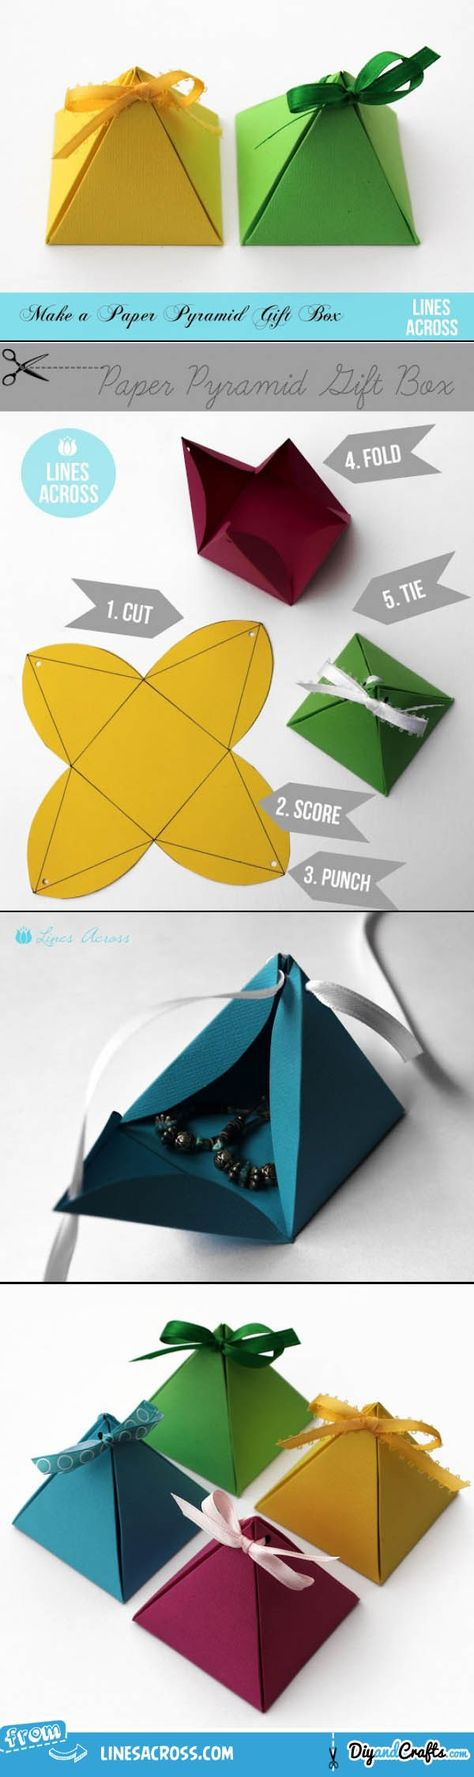 Paper Pyramid Gift Boxes   #DIY